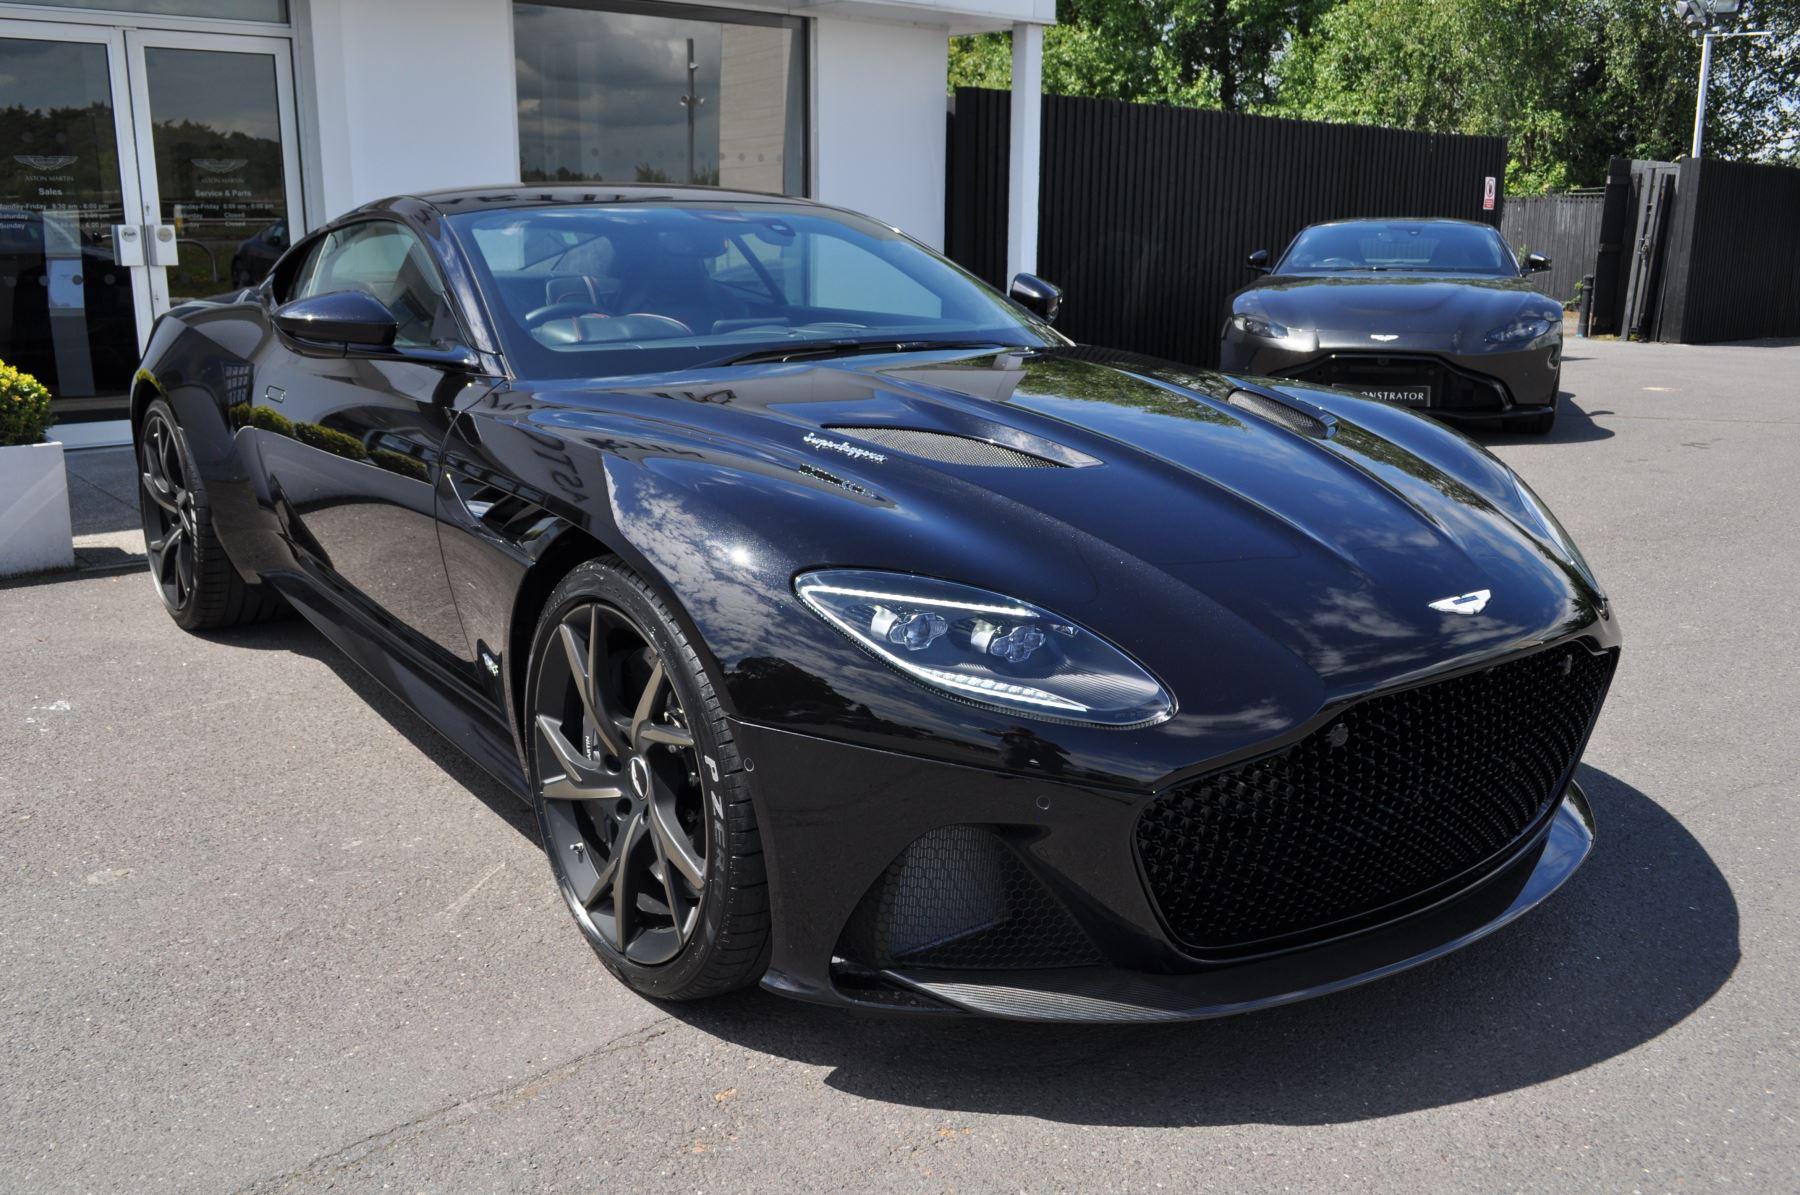 Aston Martin DBS V12 Superleggera Touchtronic image 4